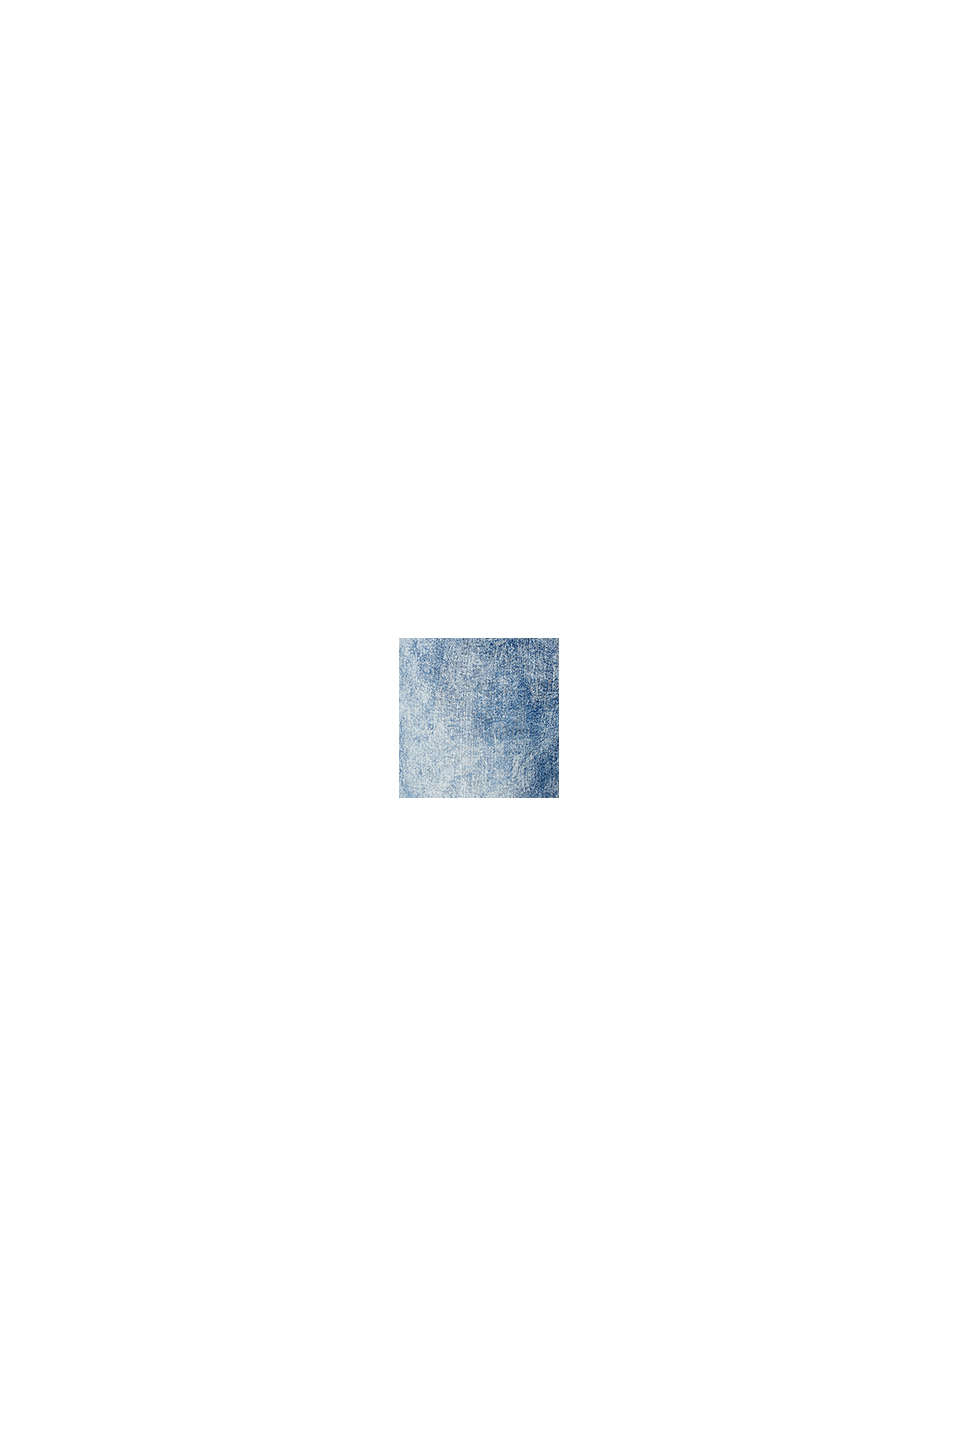 Dżinsowe szorty z panelem, BLUE LIGHT WASHED, swatch